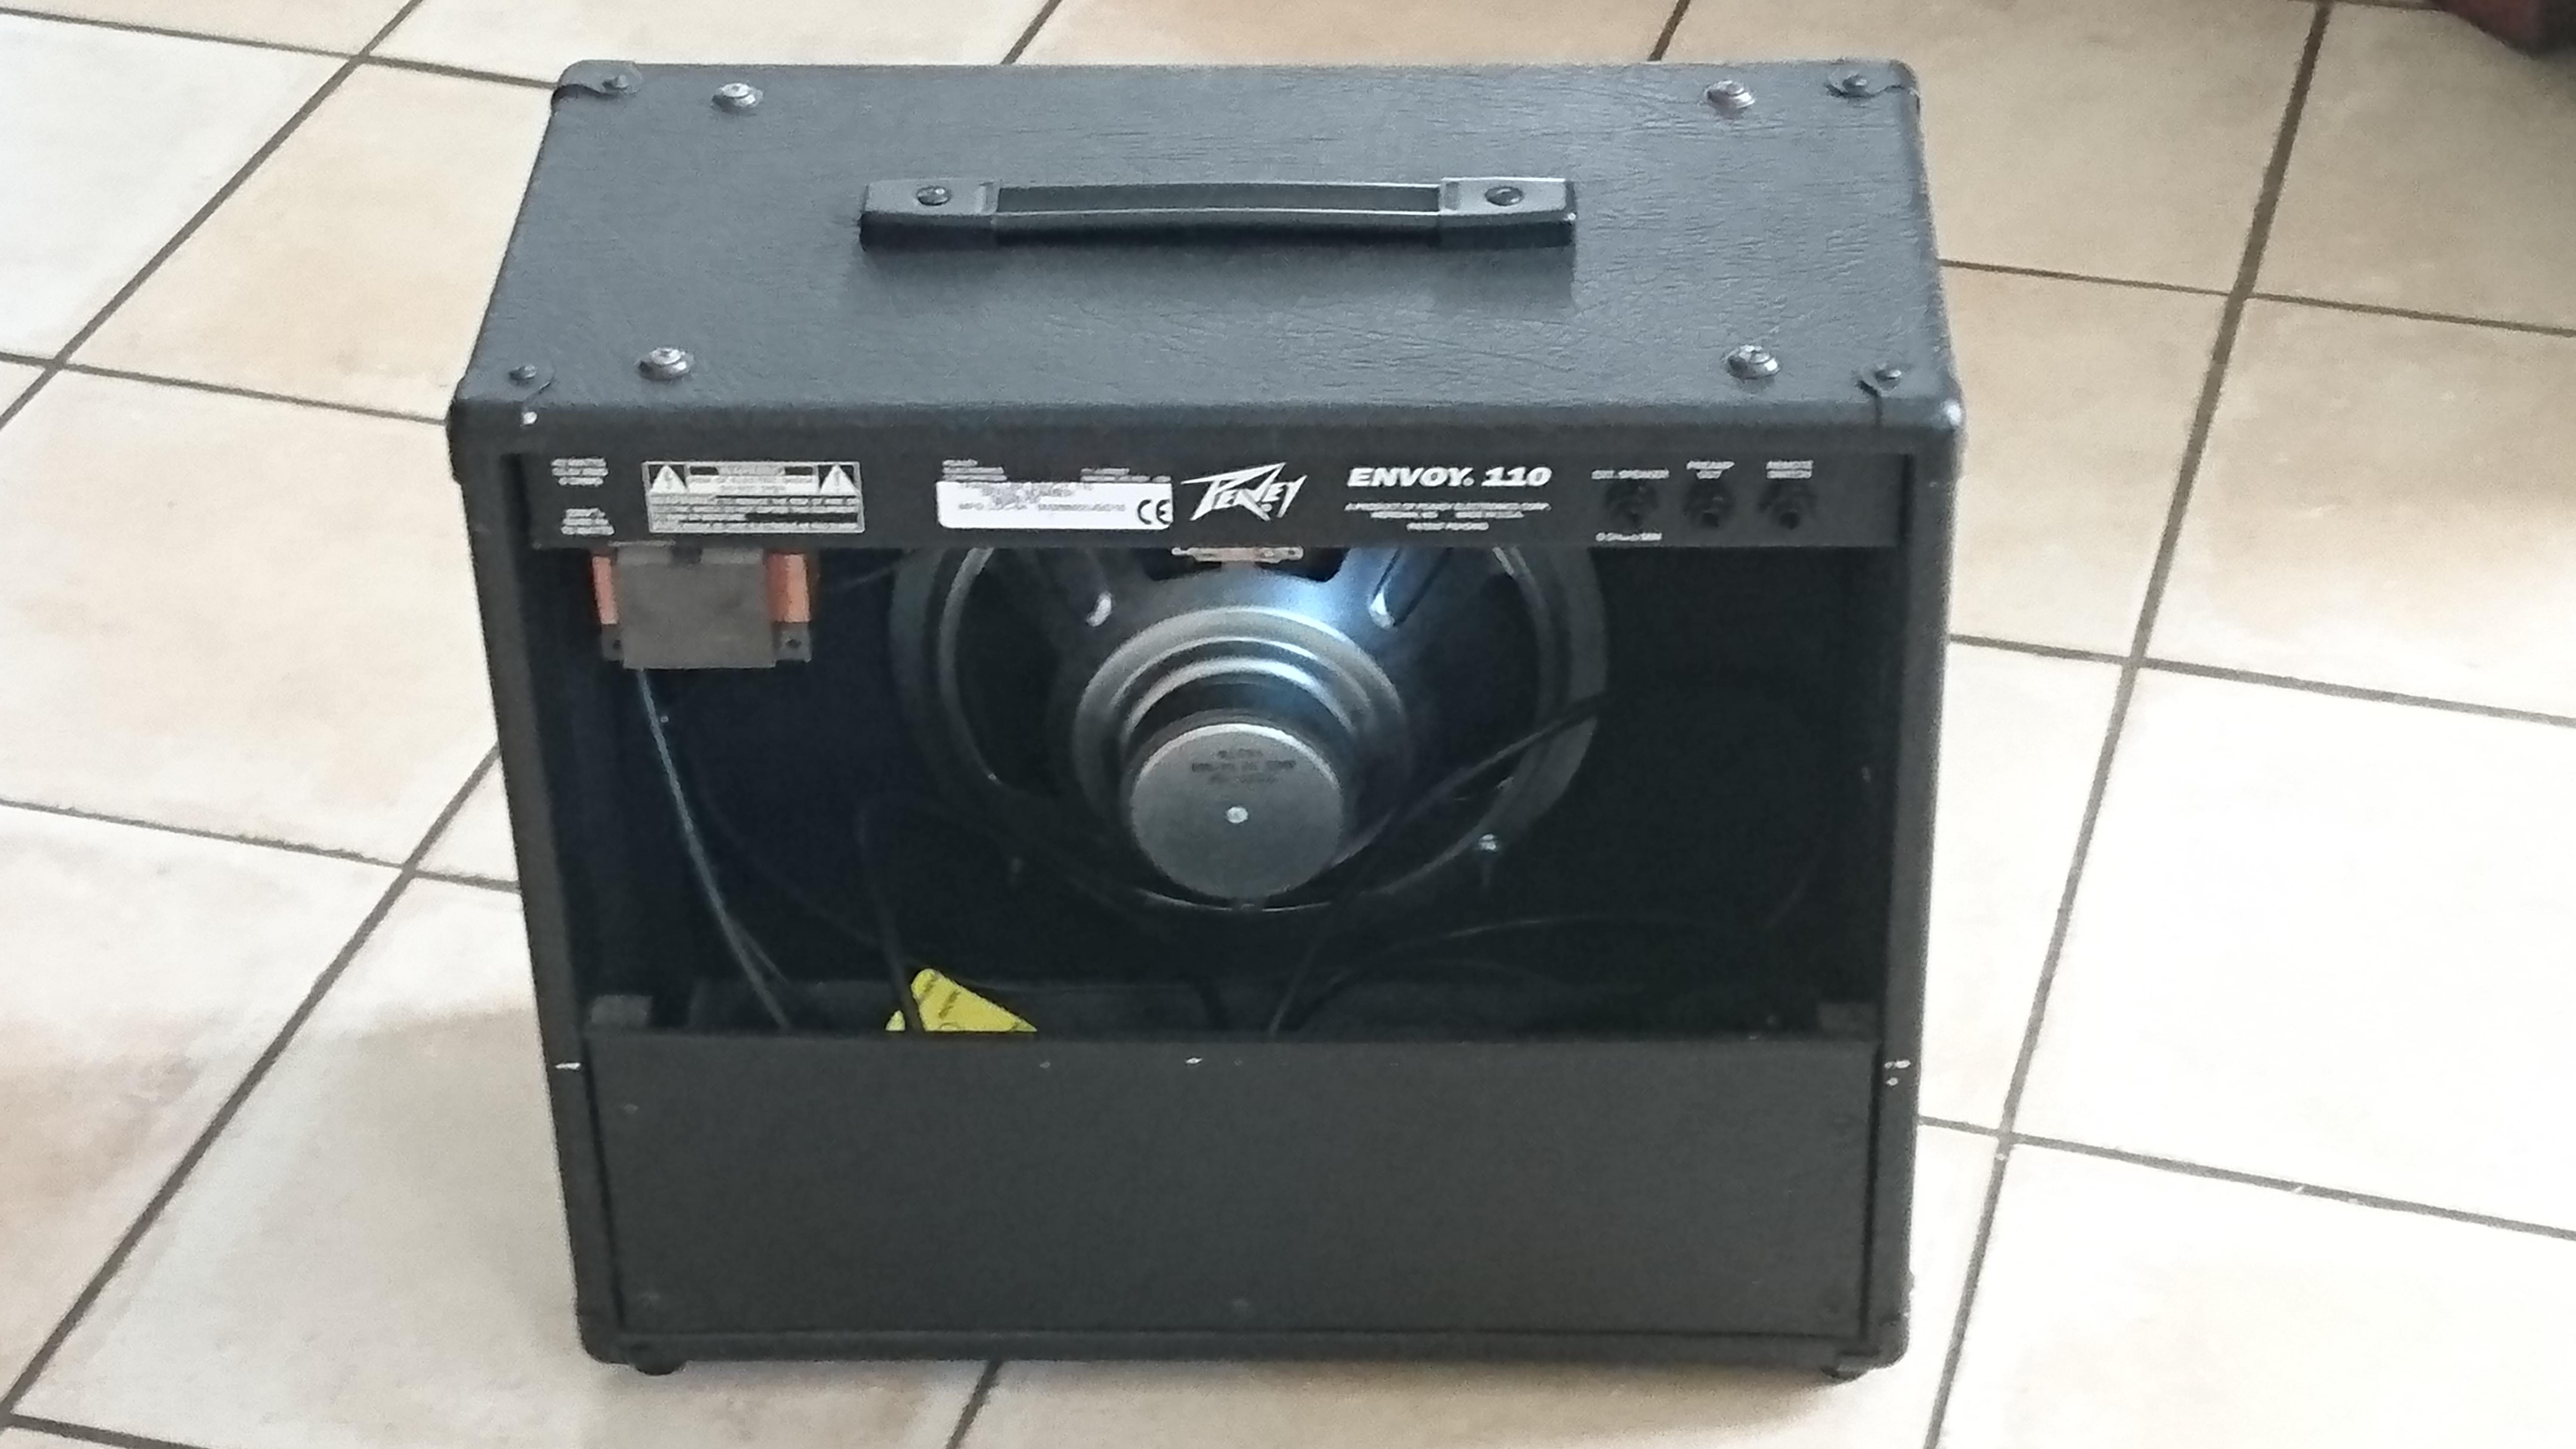 peavey envoy 110 discontinued image 1480863 audiofanzine. Black Bedroom Furniture Sets. Home Design Ideas